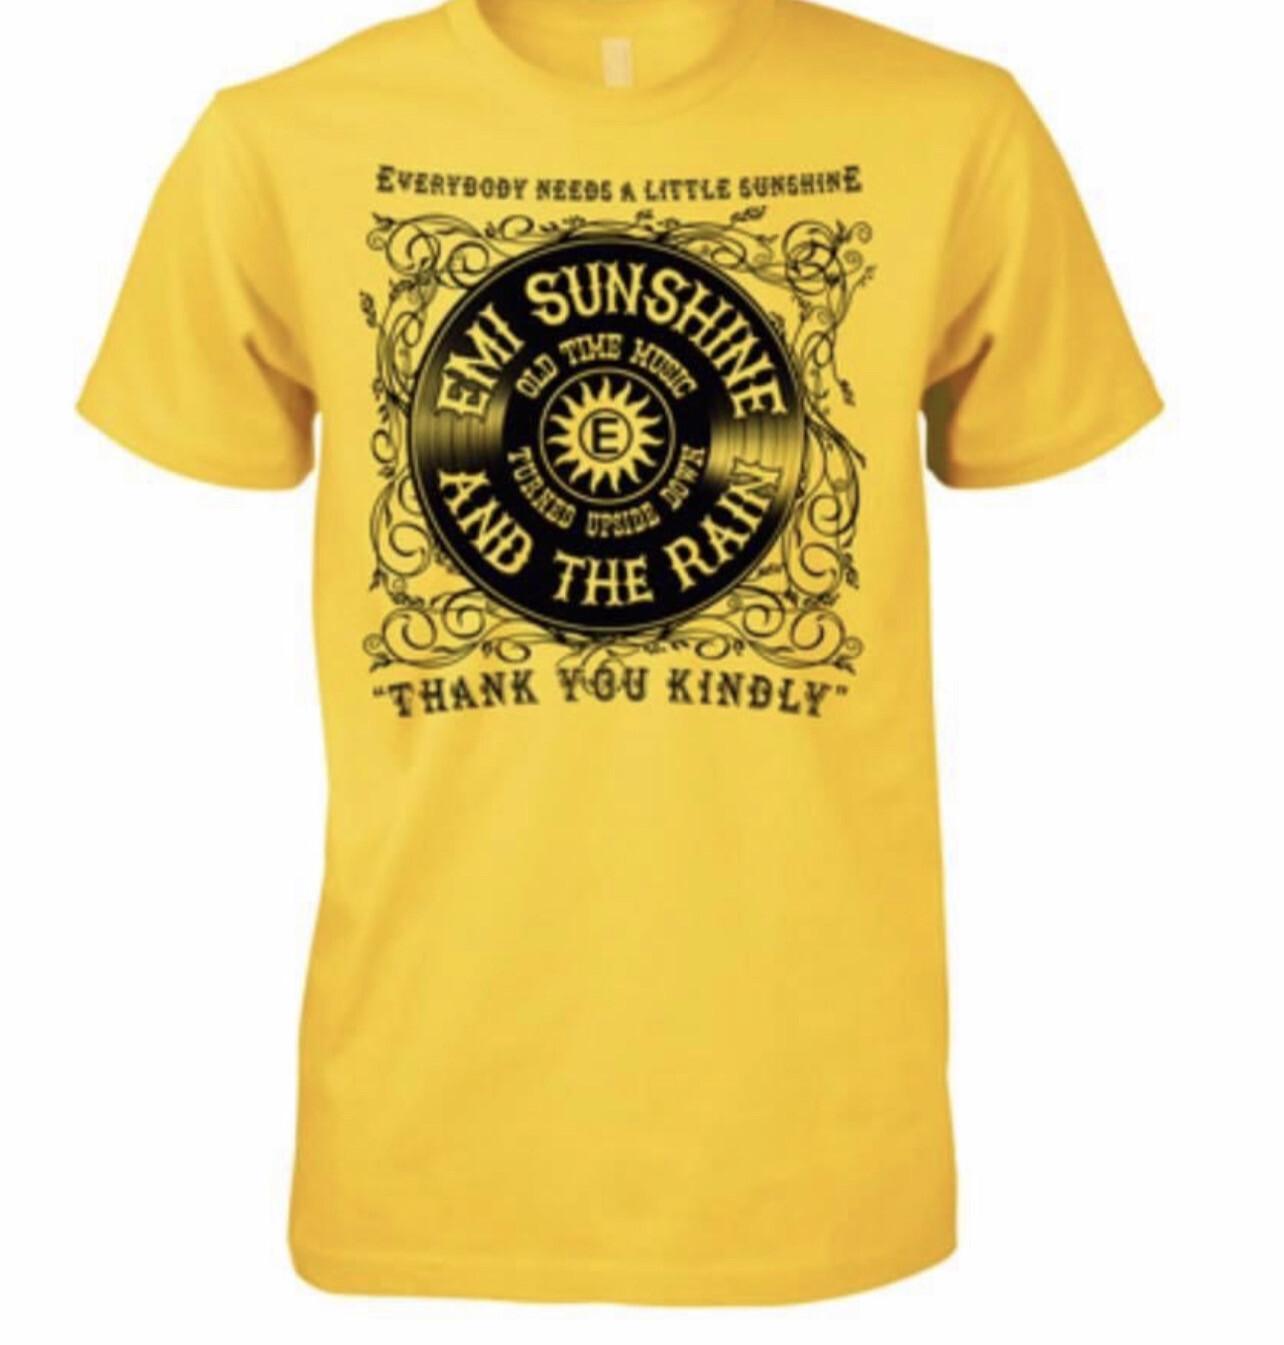 Original EmiSunshine Shirt 2XL